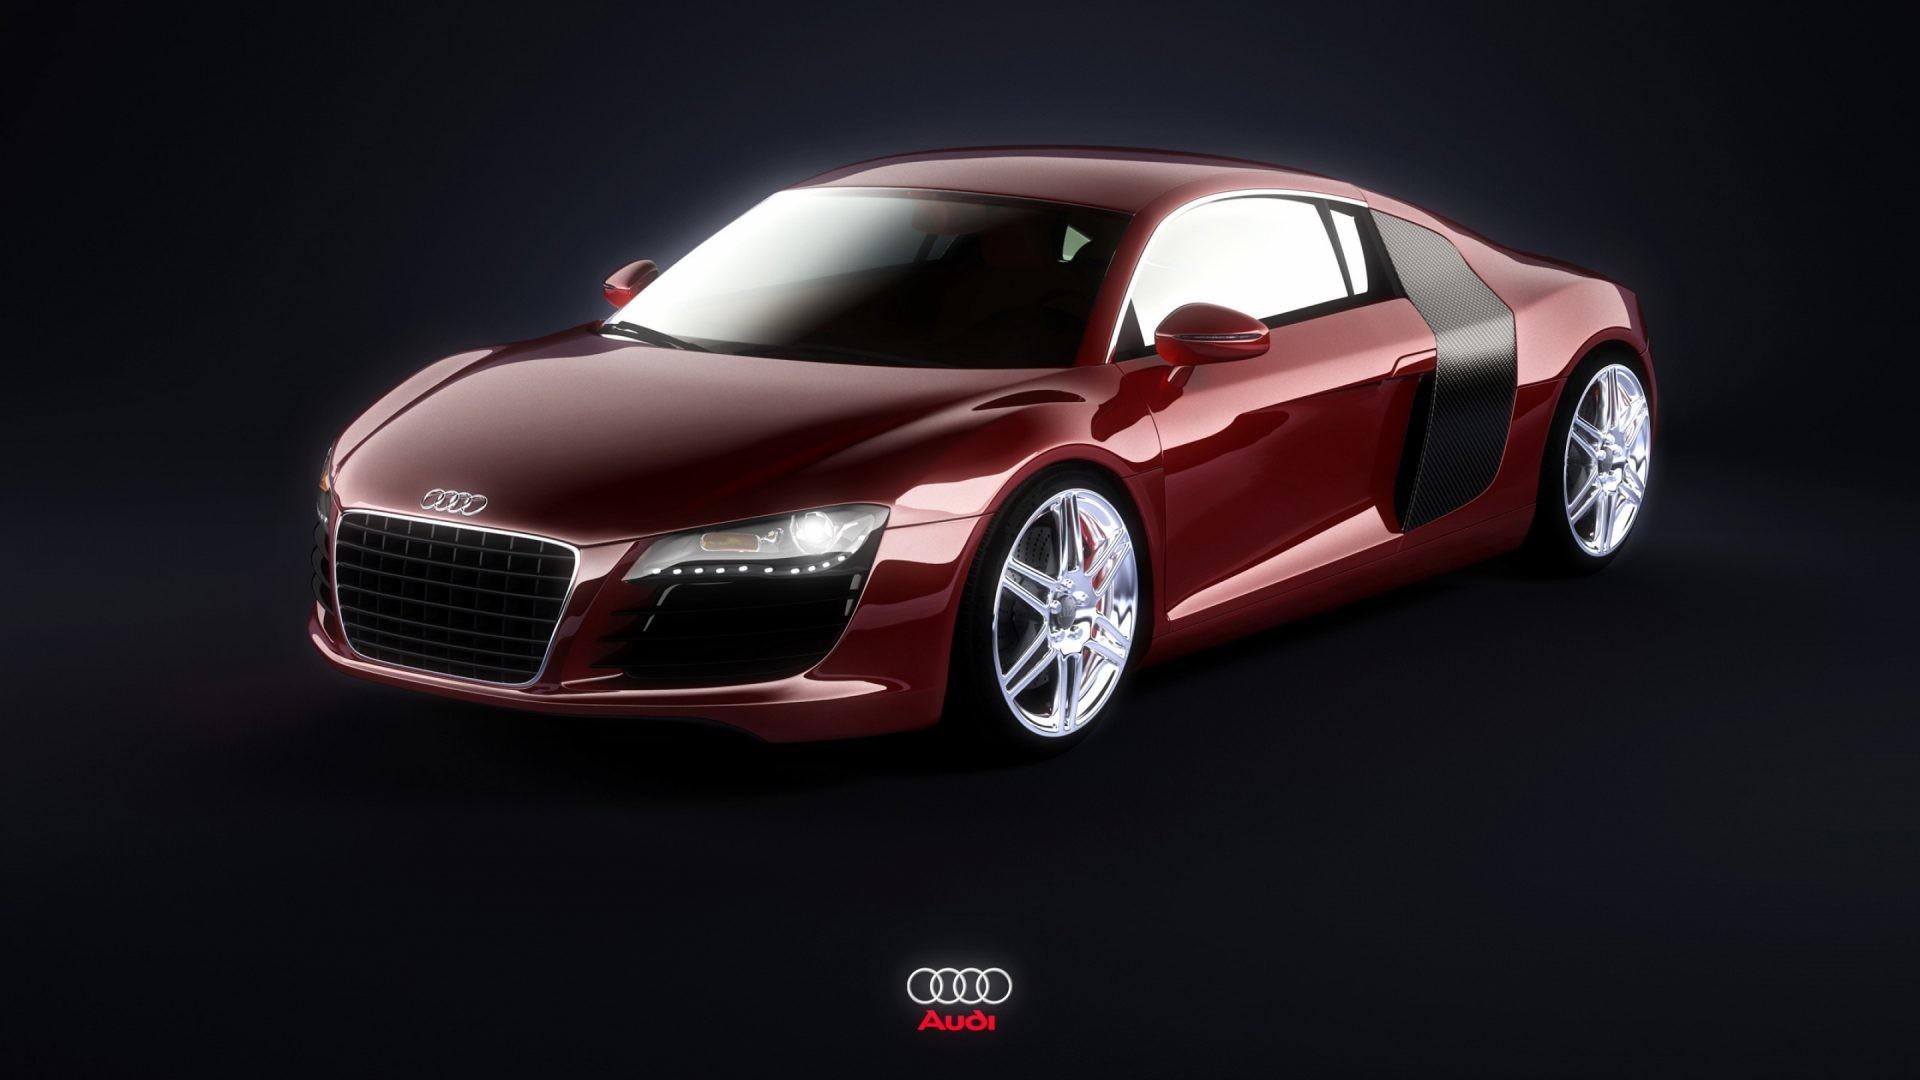 Audi R8 Burgundy 4k HD Wallpaper